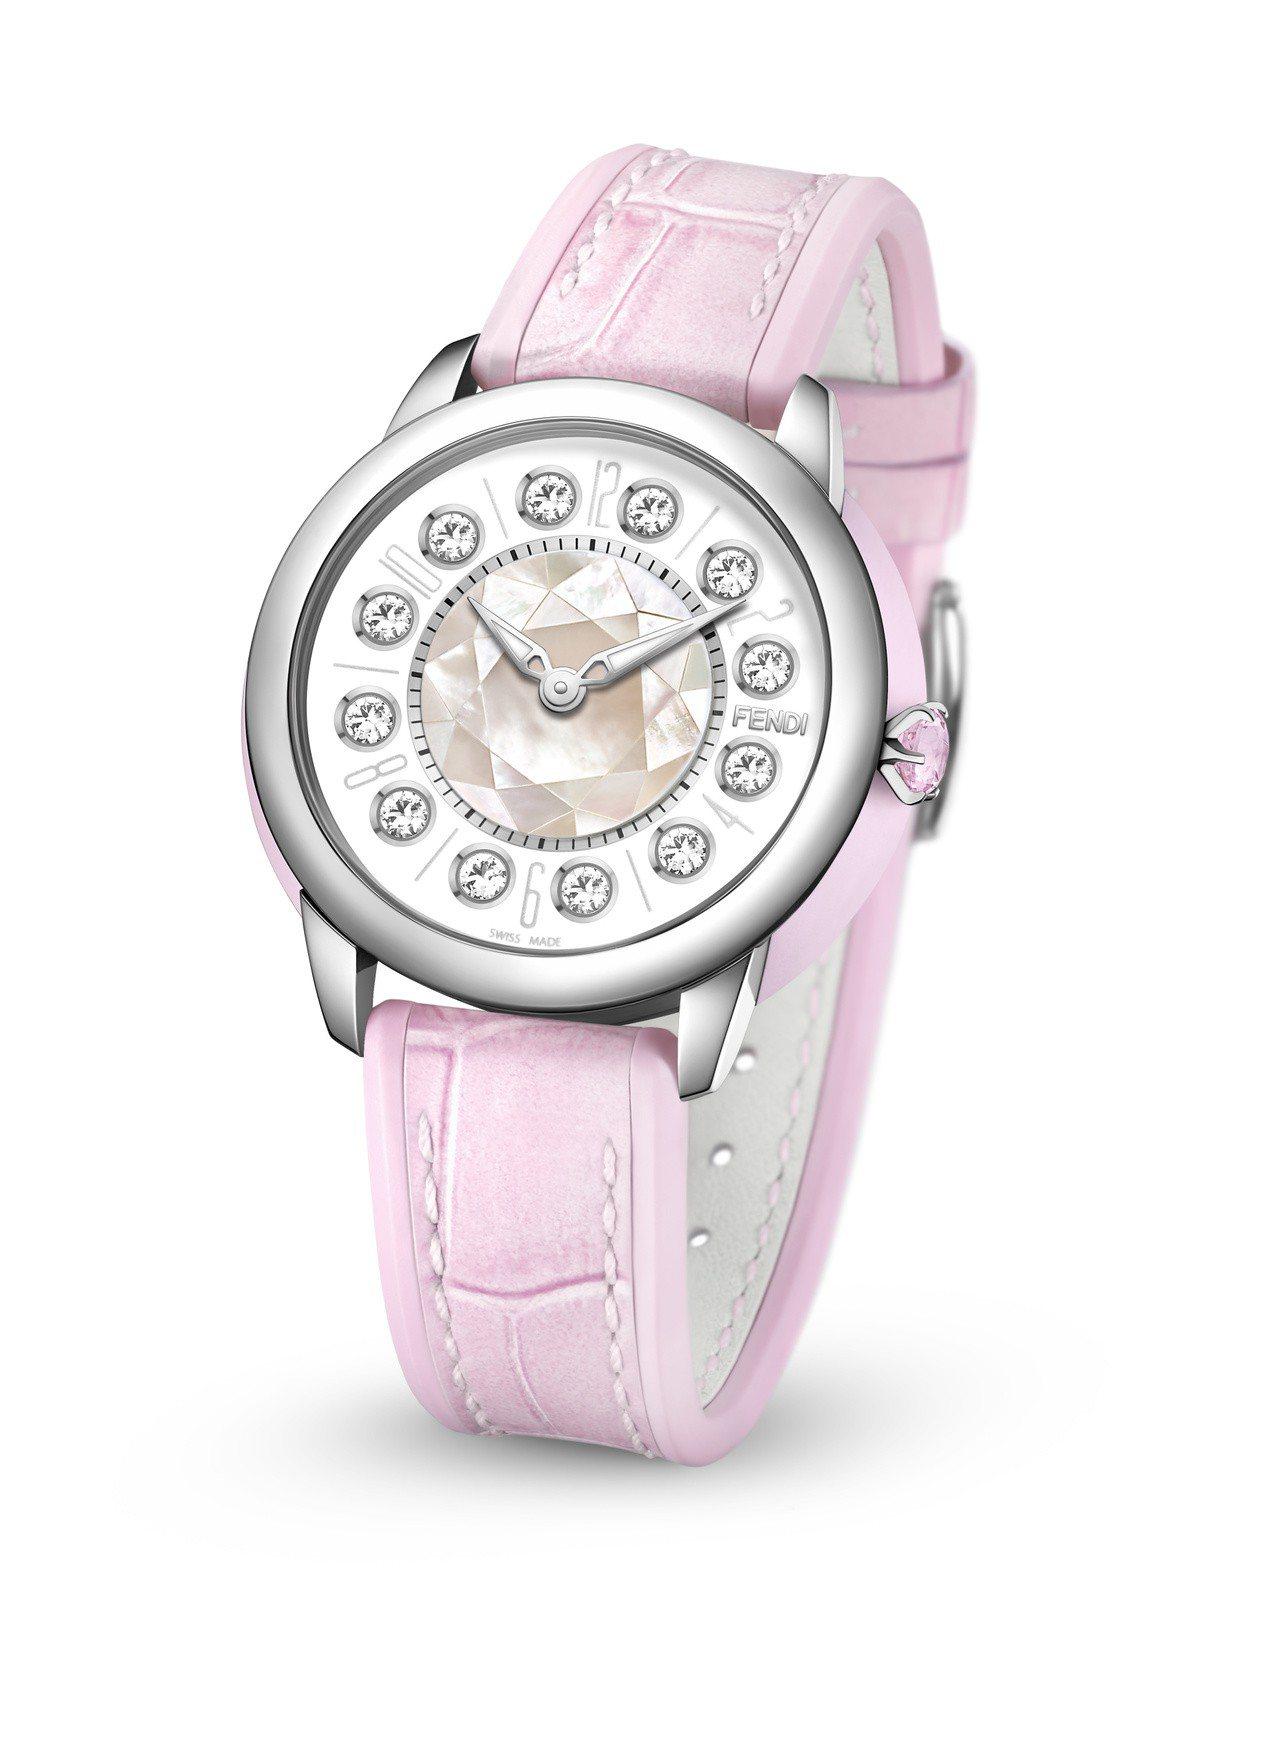 Fendi ISHINE系列腕表,採用專利旋轉寶石機制,搭配粉色拓帕石表冠,與同...